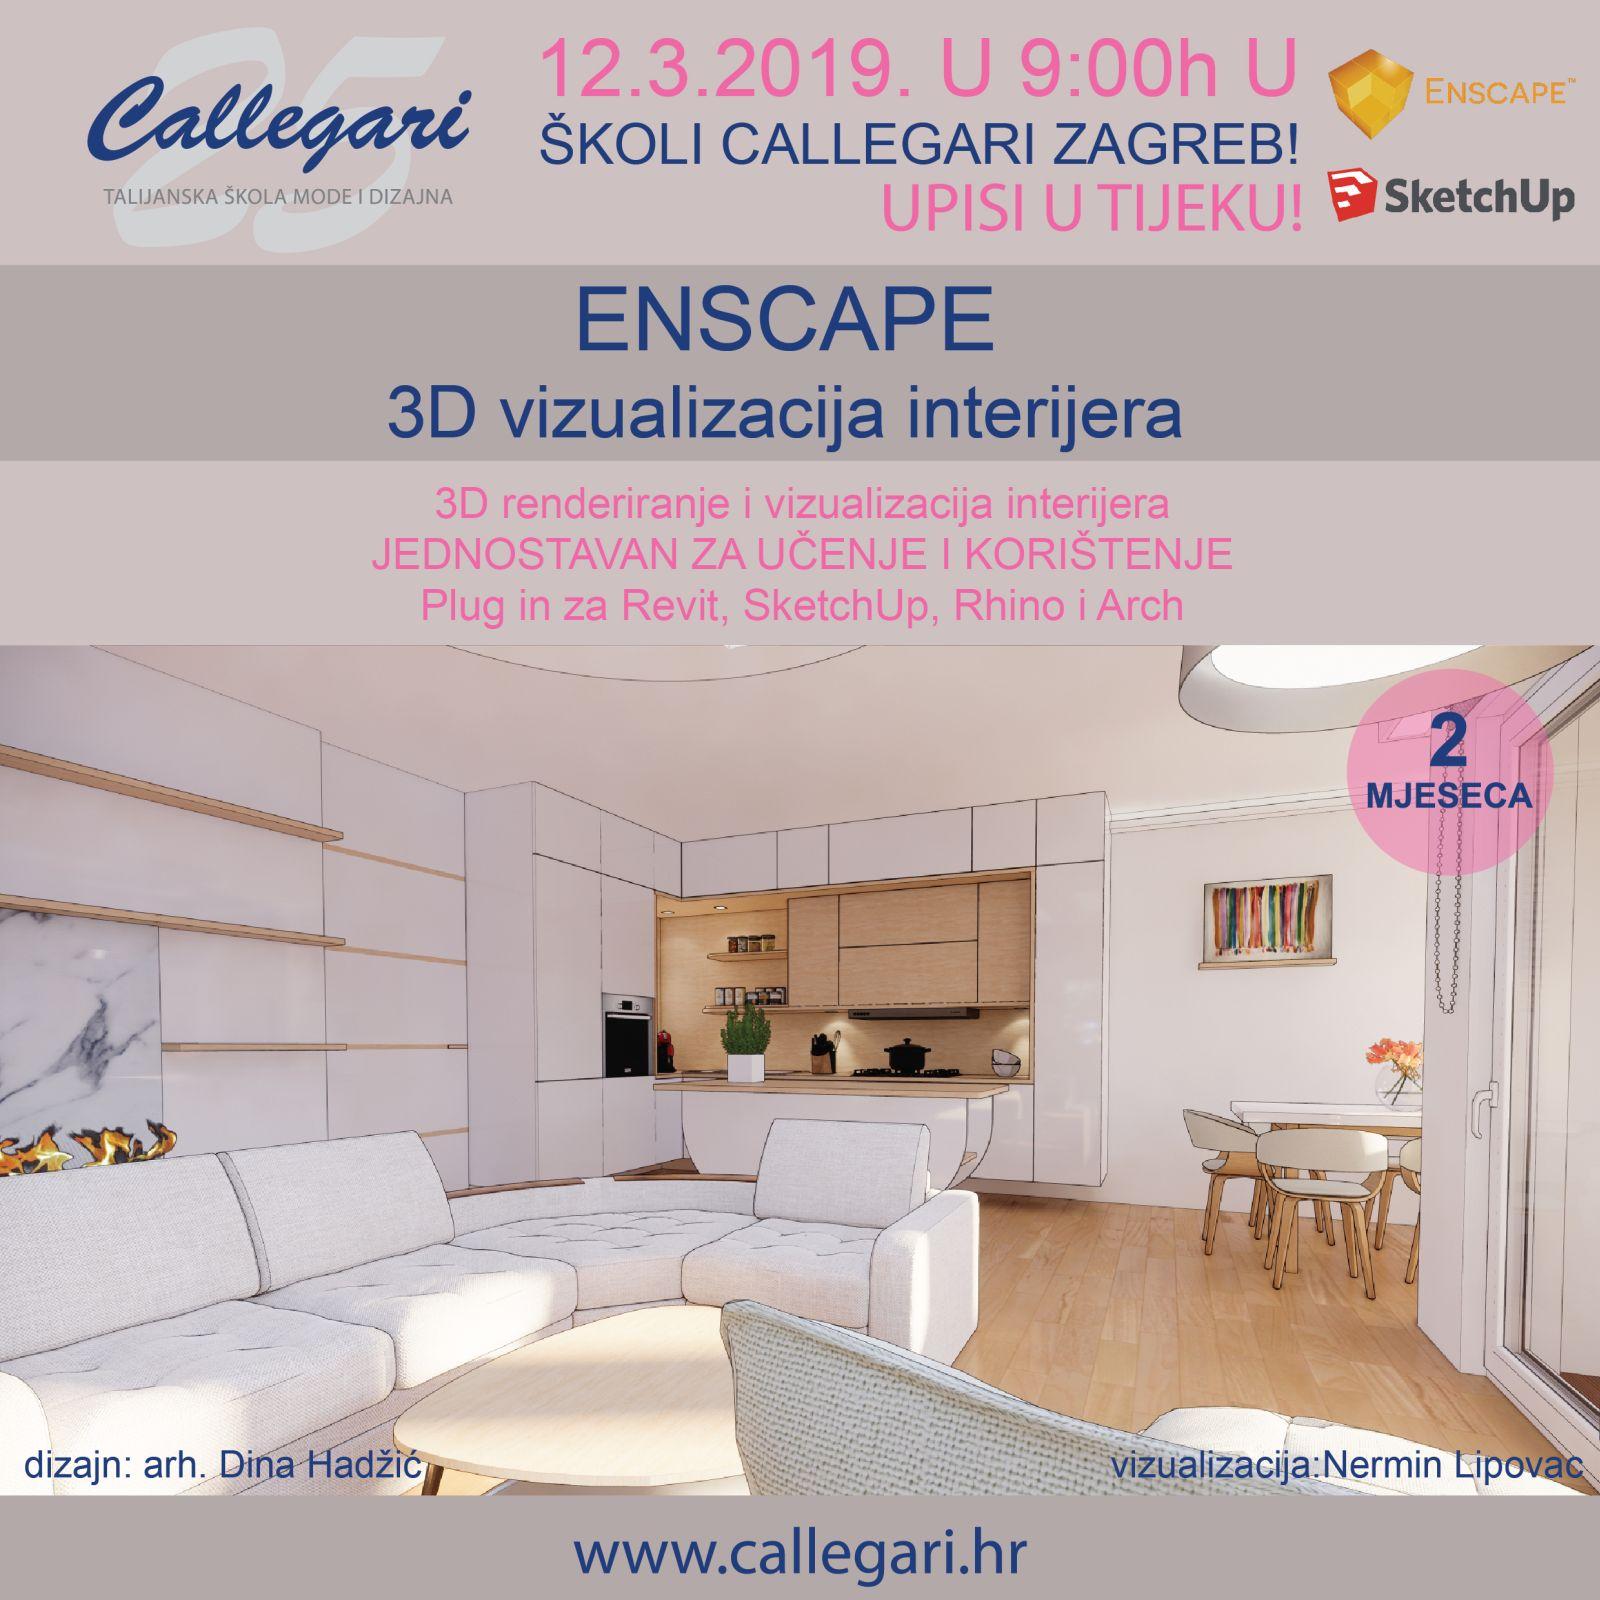 ENSCAPE -  3D renderiranje i vizualizacija interijera